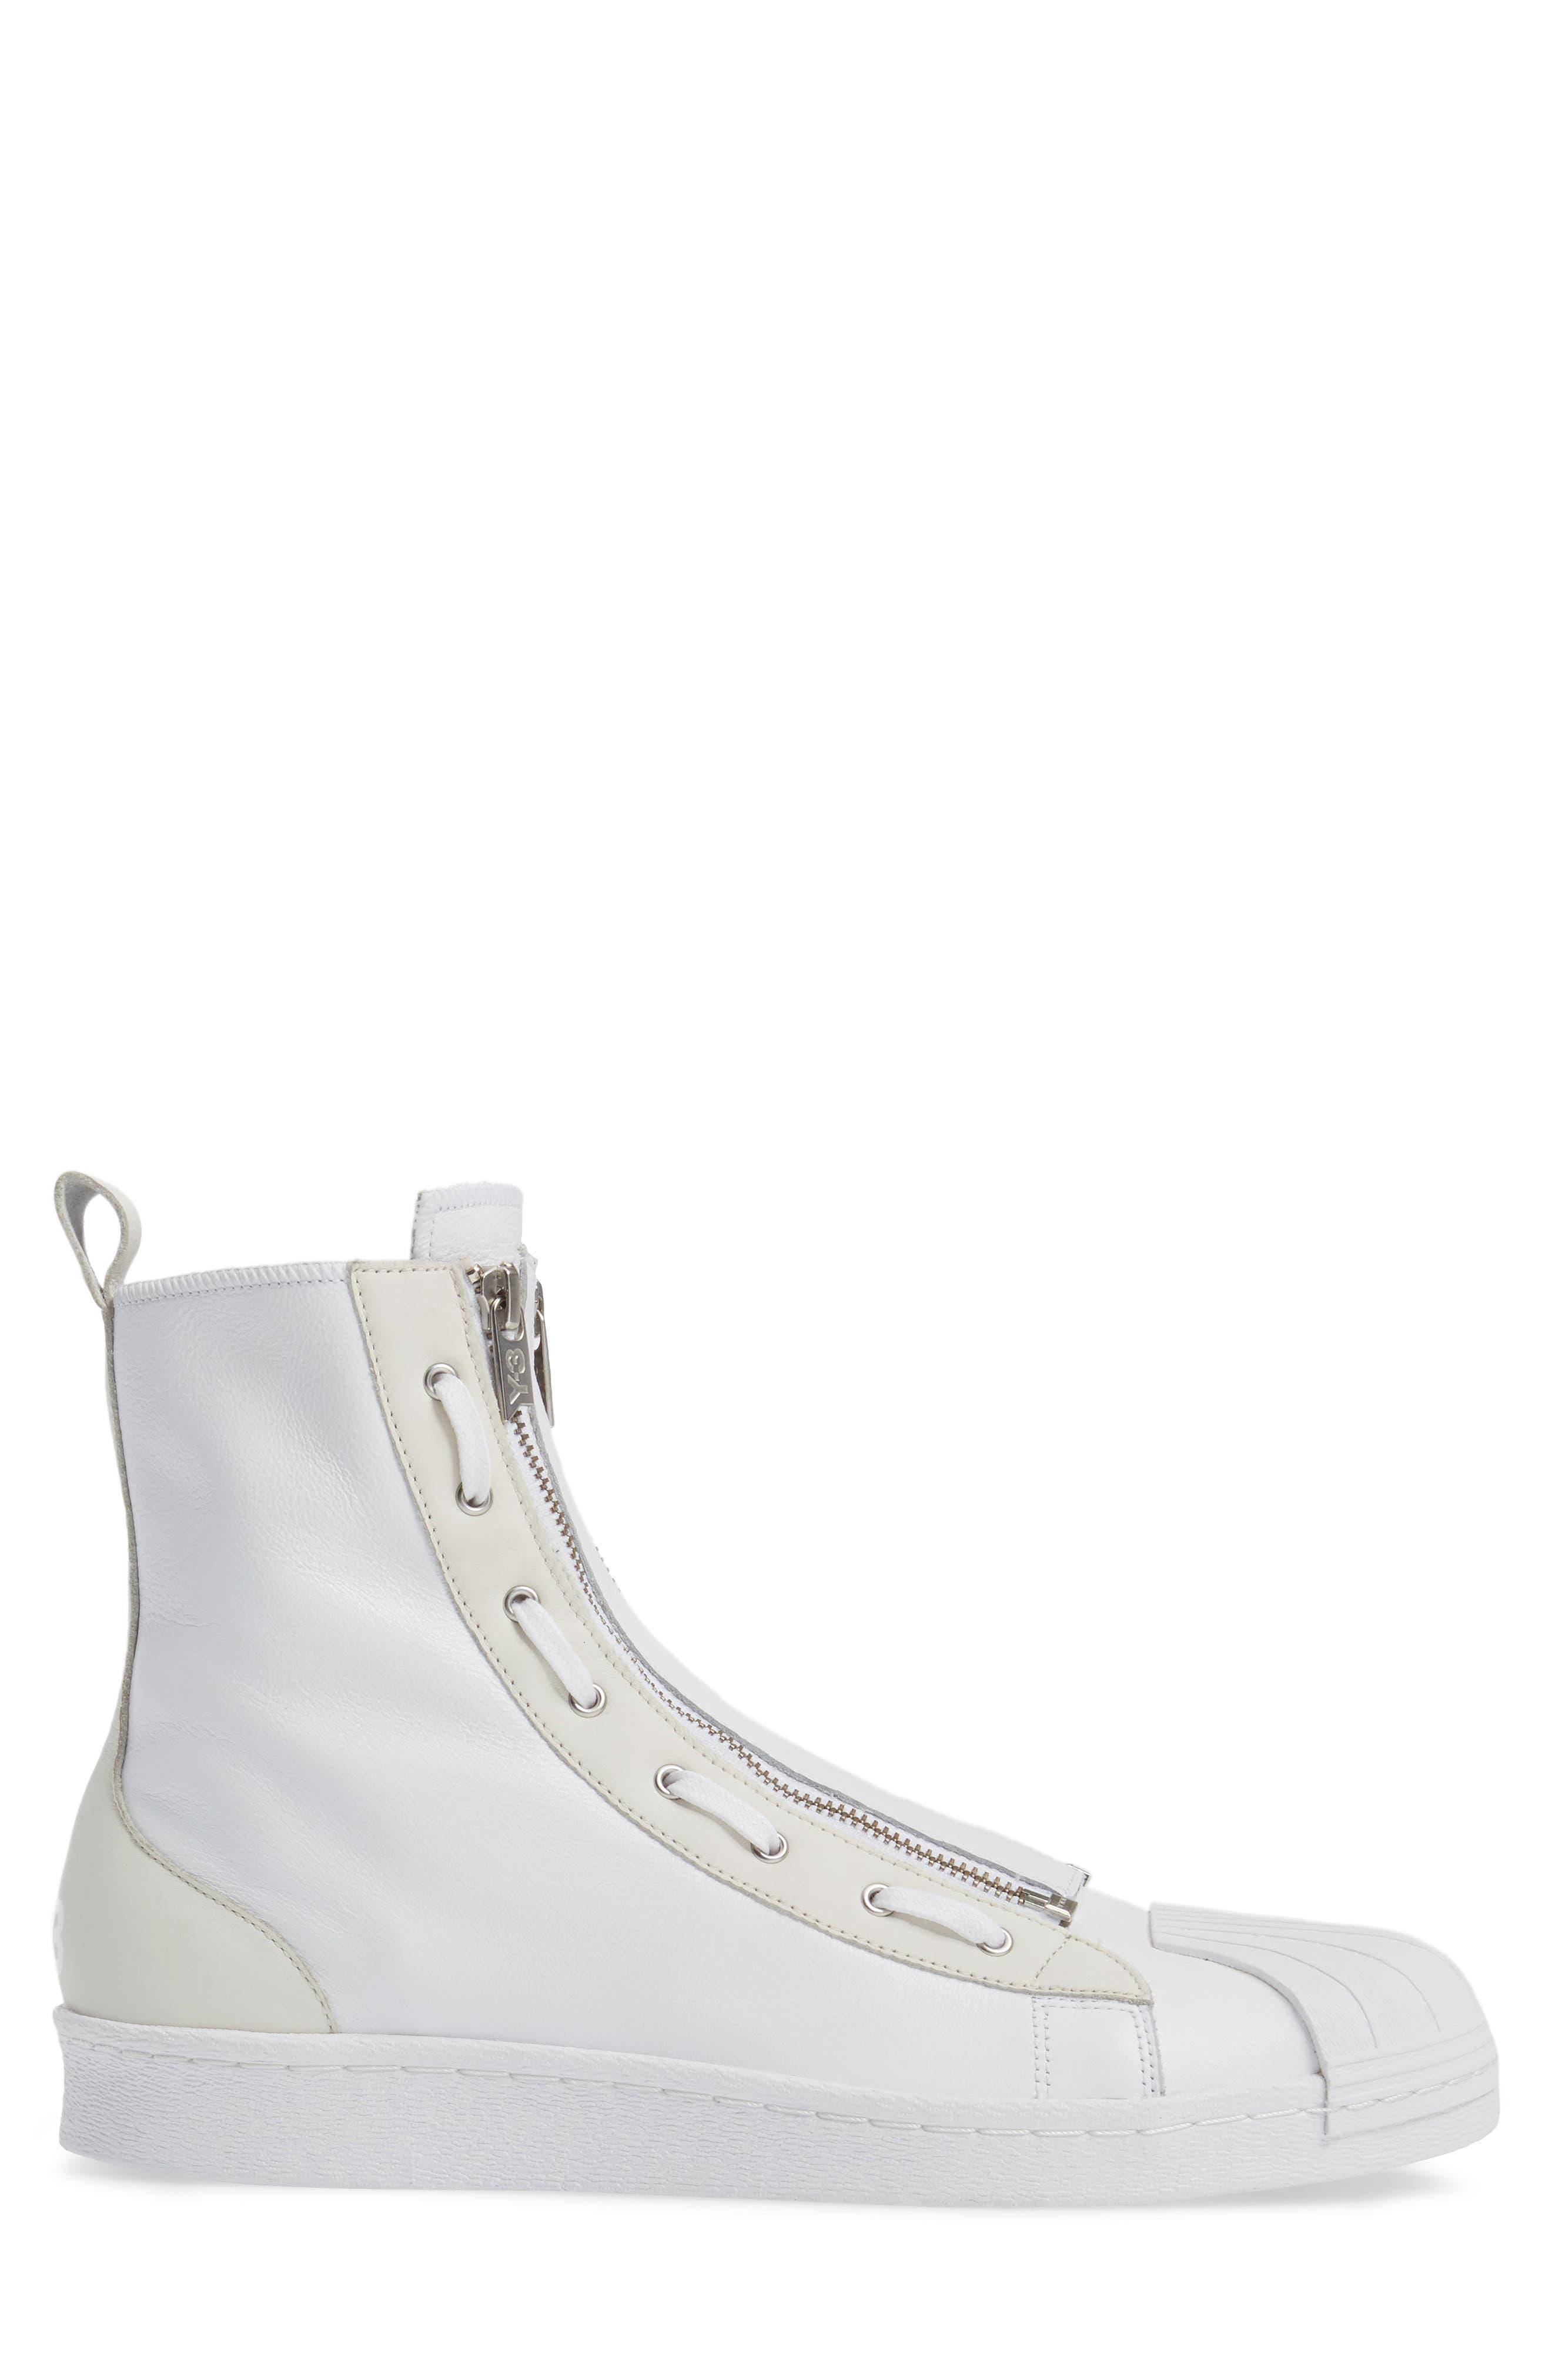 Alternate Image 3  - Y-3 'Pro' High Top Sneaker (Men)